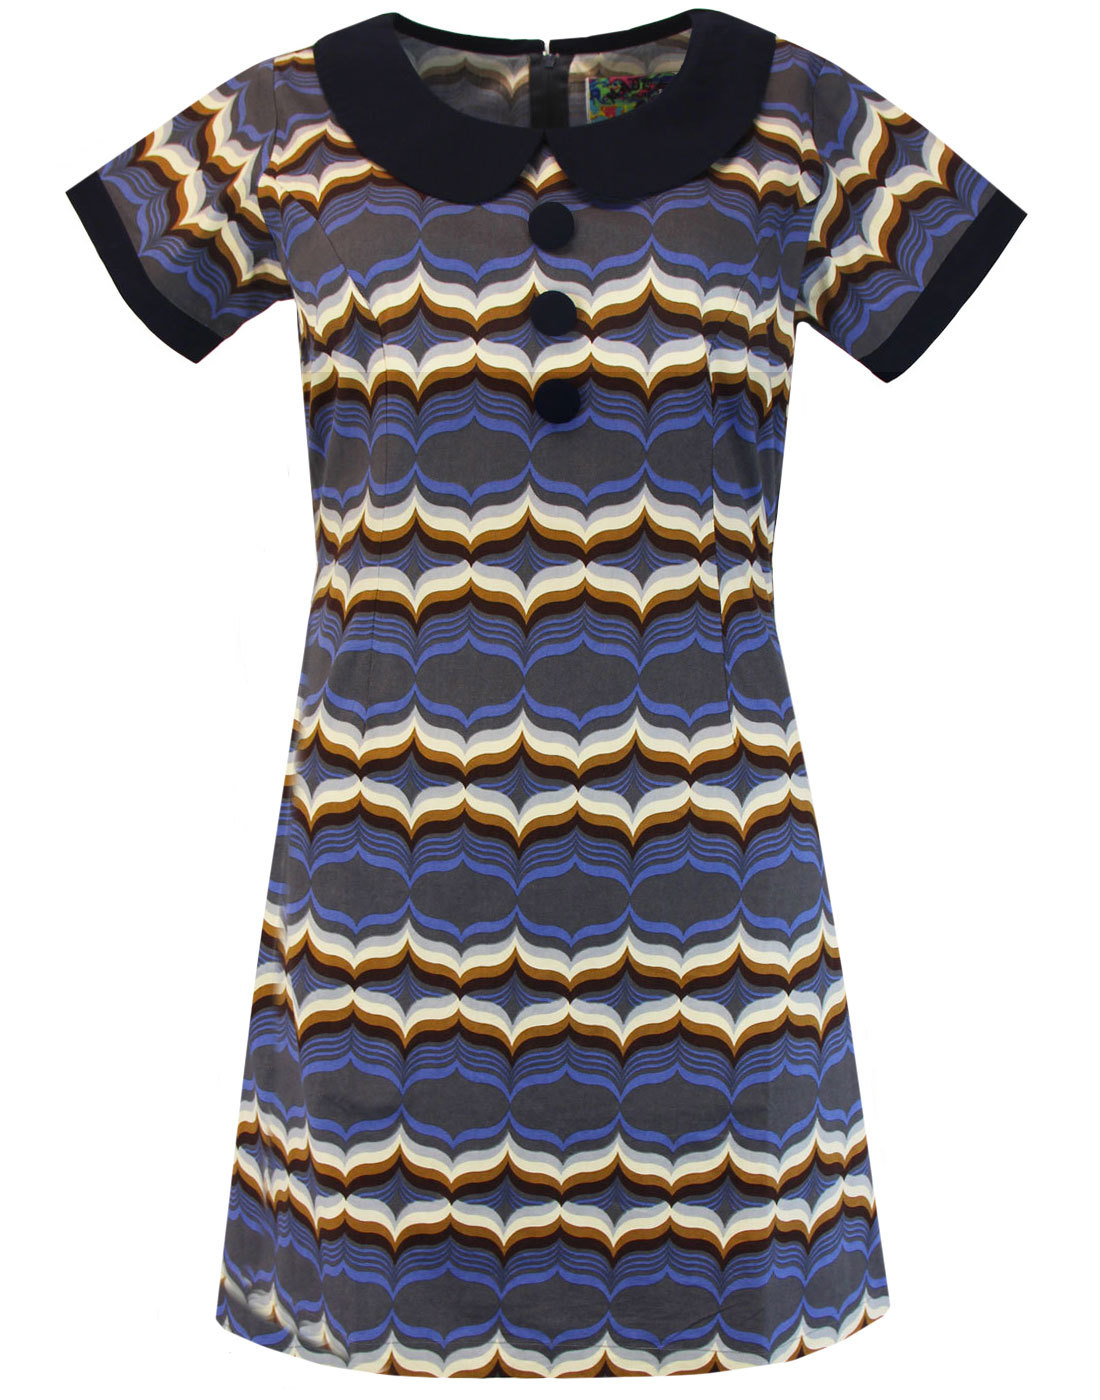 madcap england dollierocker waves 60s mod dress